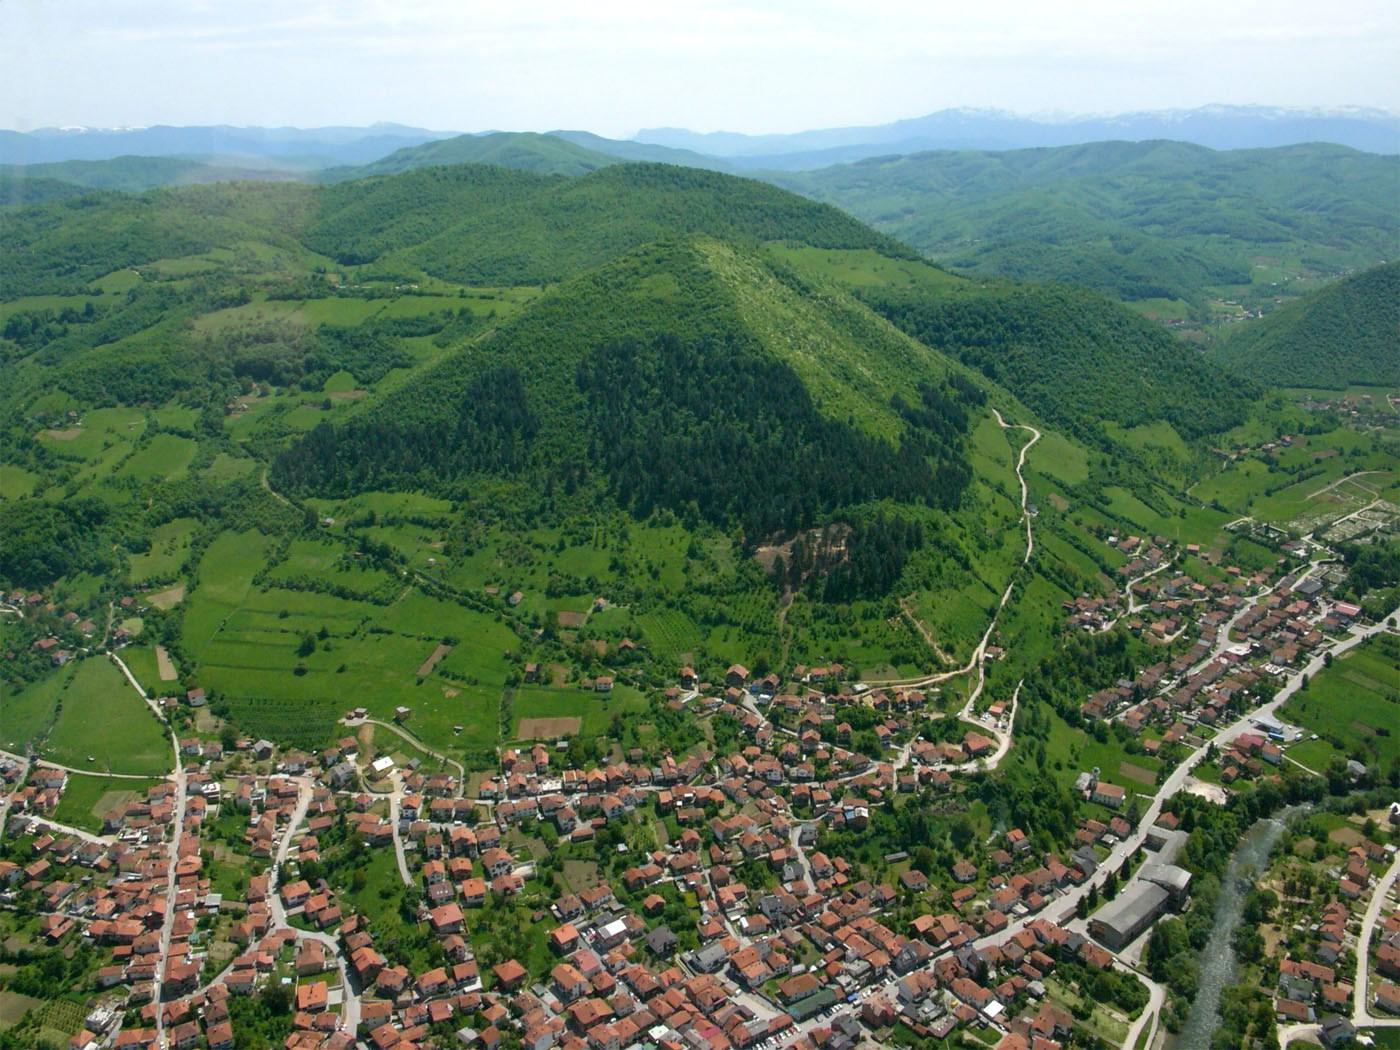 bosnian-pyramids-trinfinity8